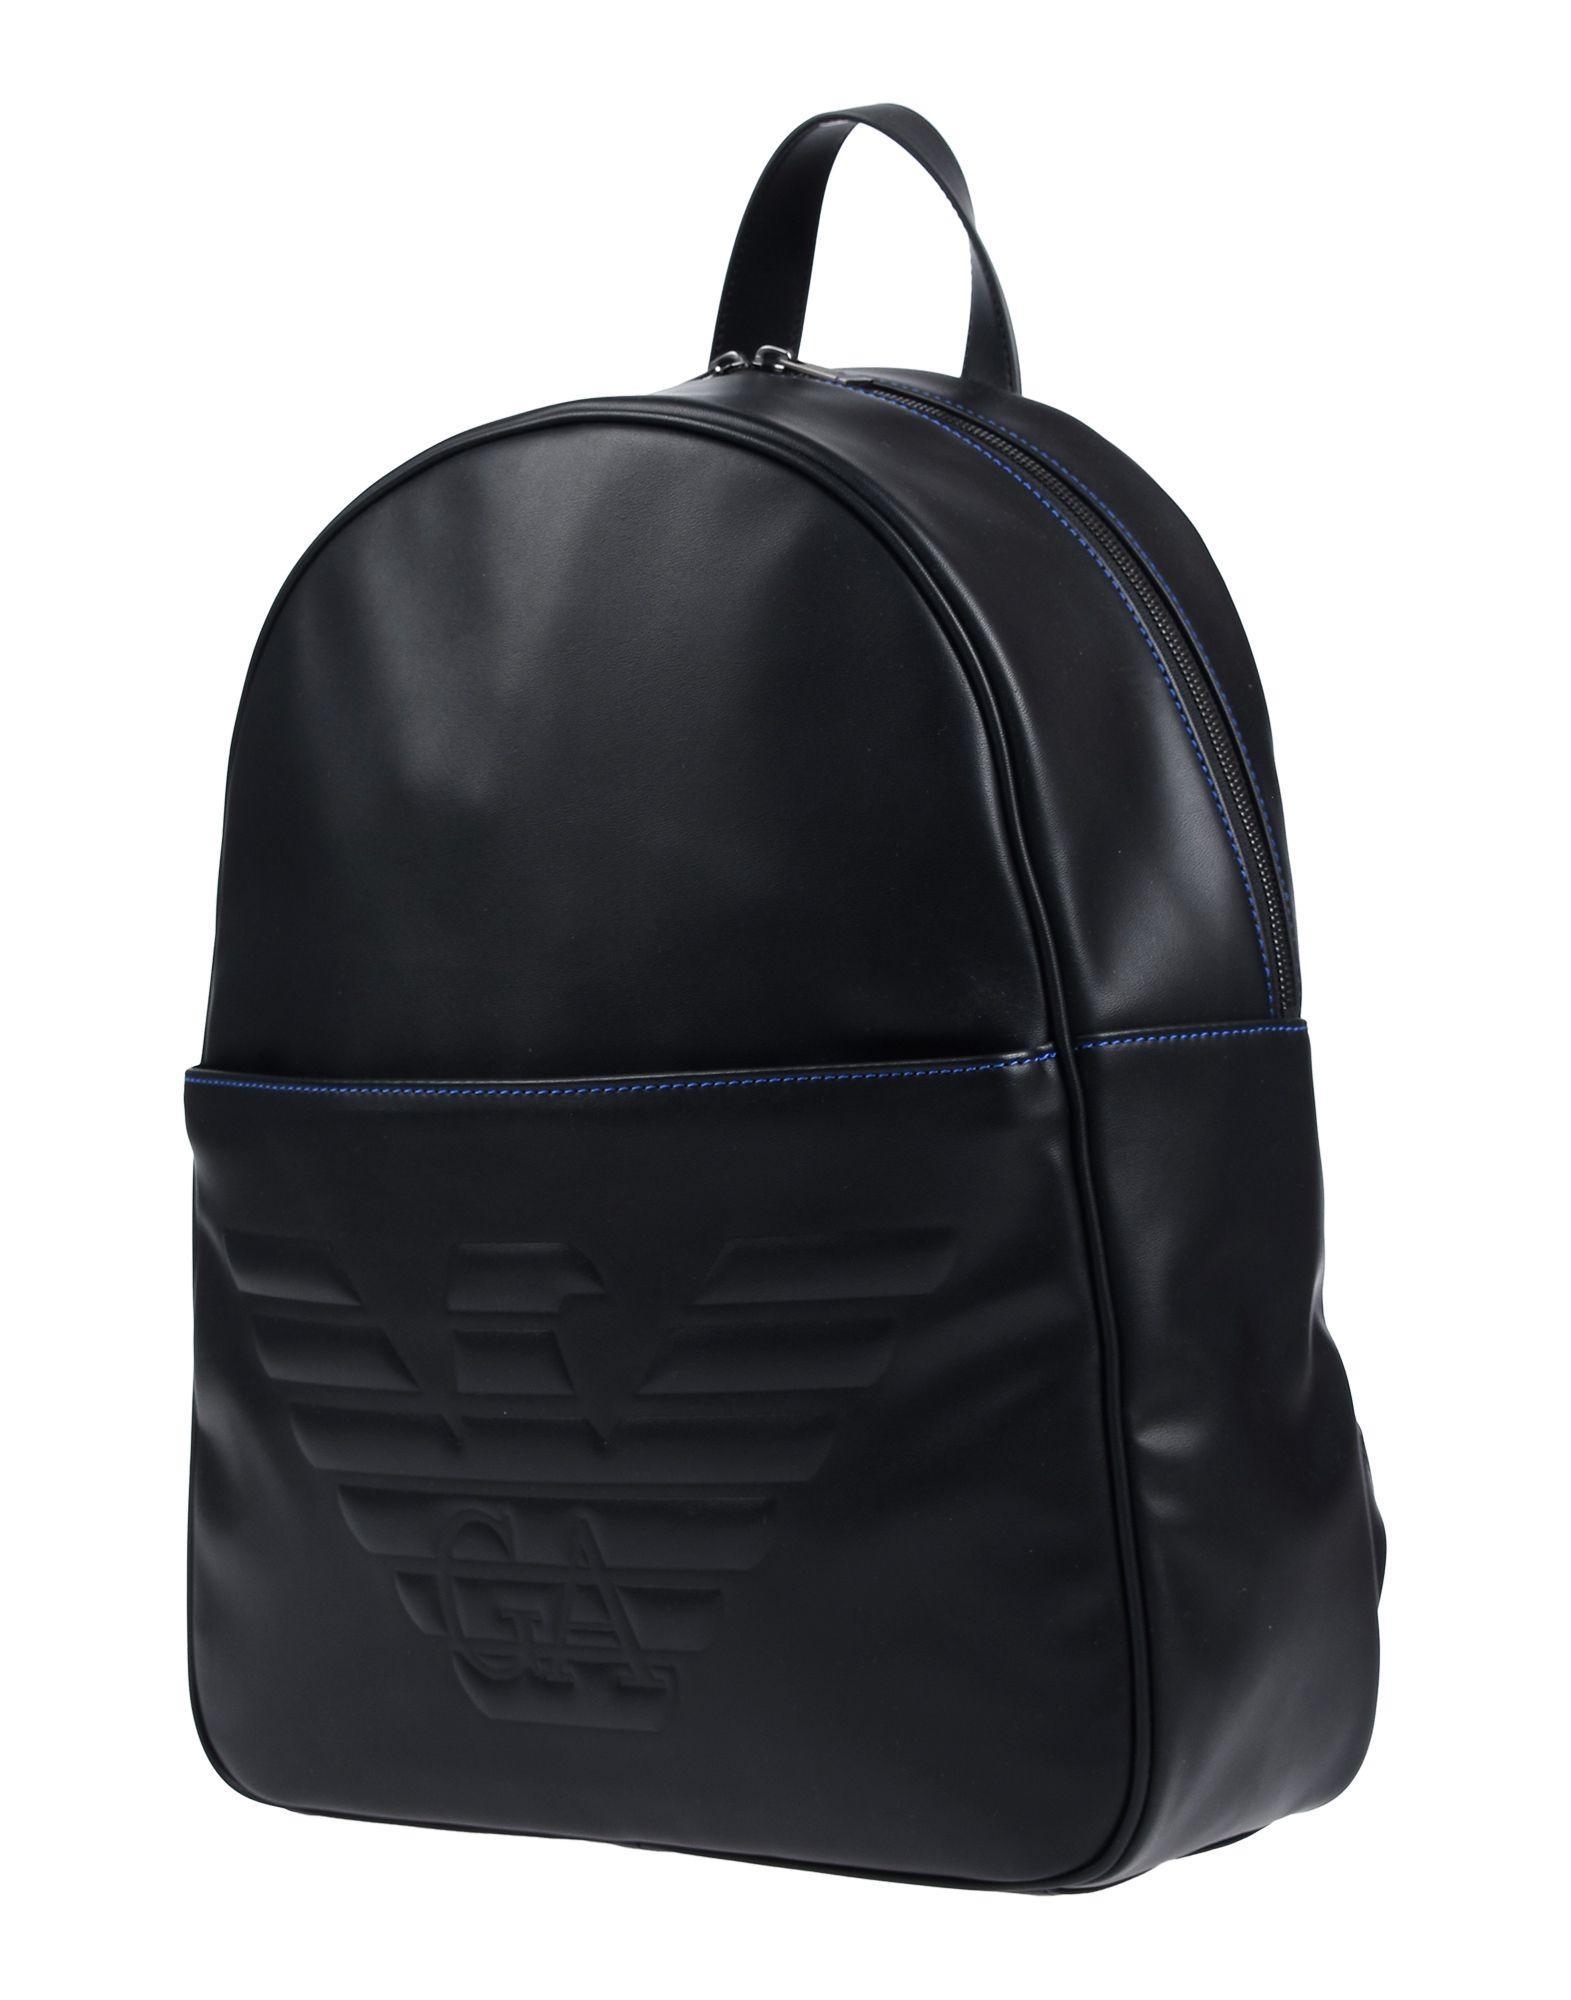 Emporio Armani Backpacks   Bum Bags in Black for Men - Lyst ed4efb6d67341